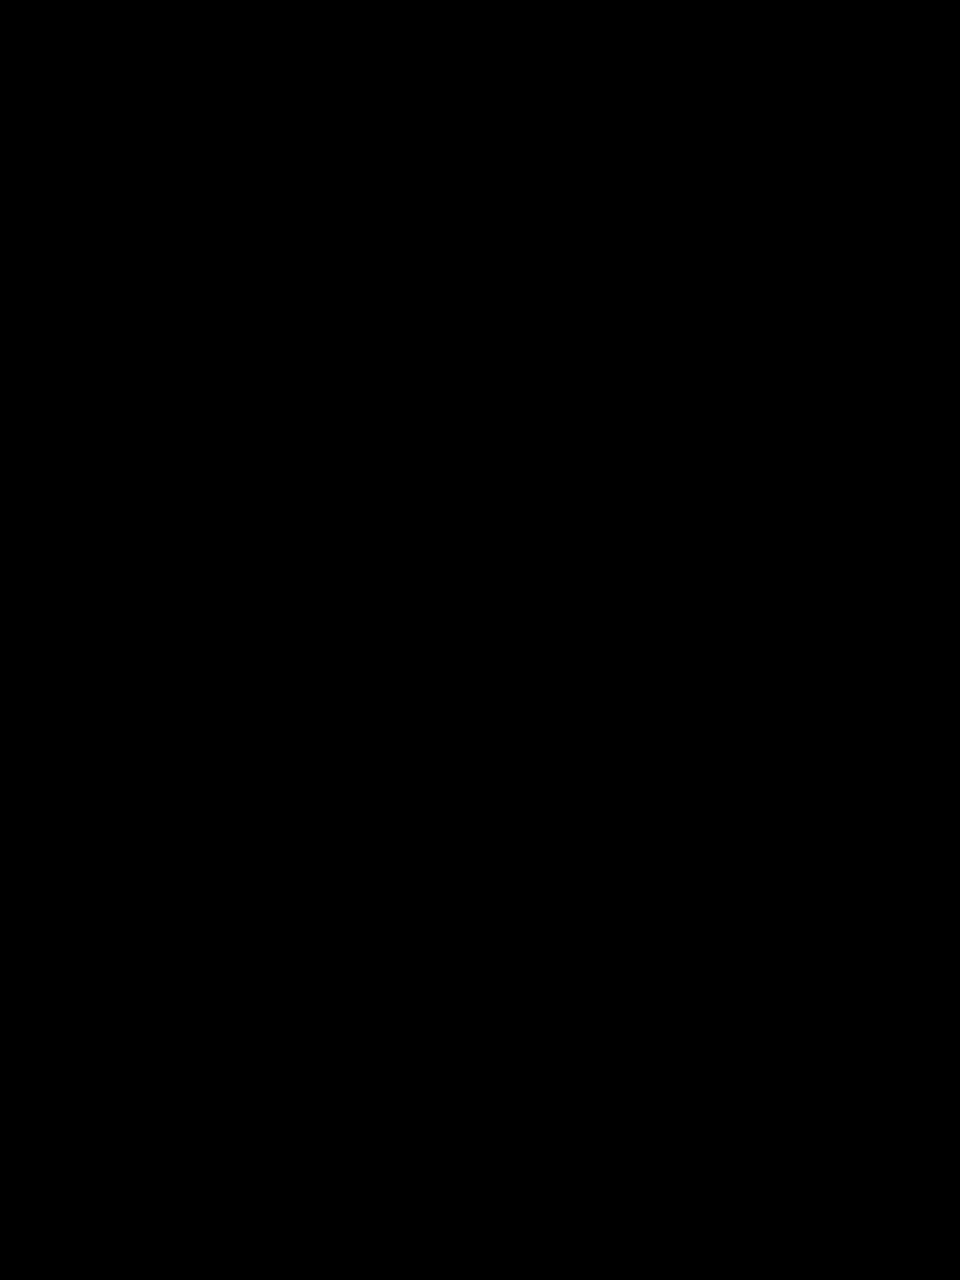 [Atelier Hachifukuan] Superheroine Yuukai Ryoujoku 8 - Superheroine in Distress - Chrome Rose Bell II [English] [Harasho Project] 35